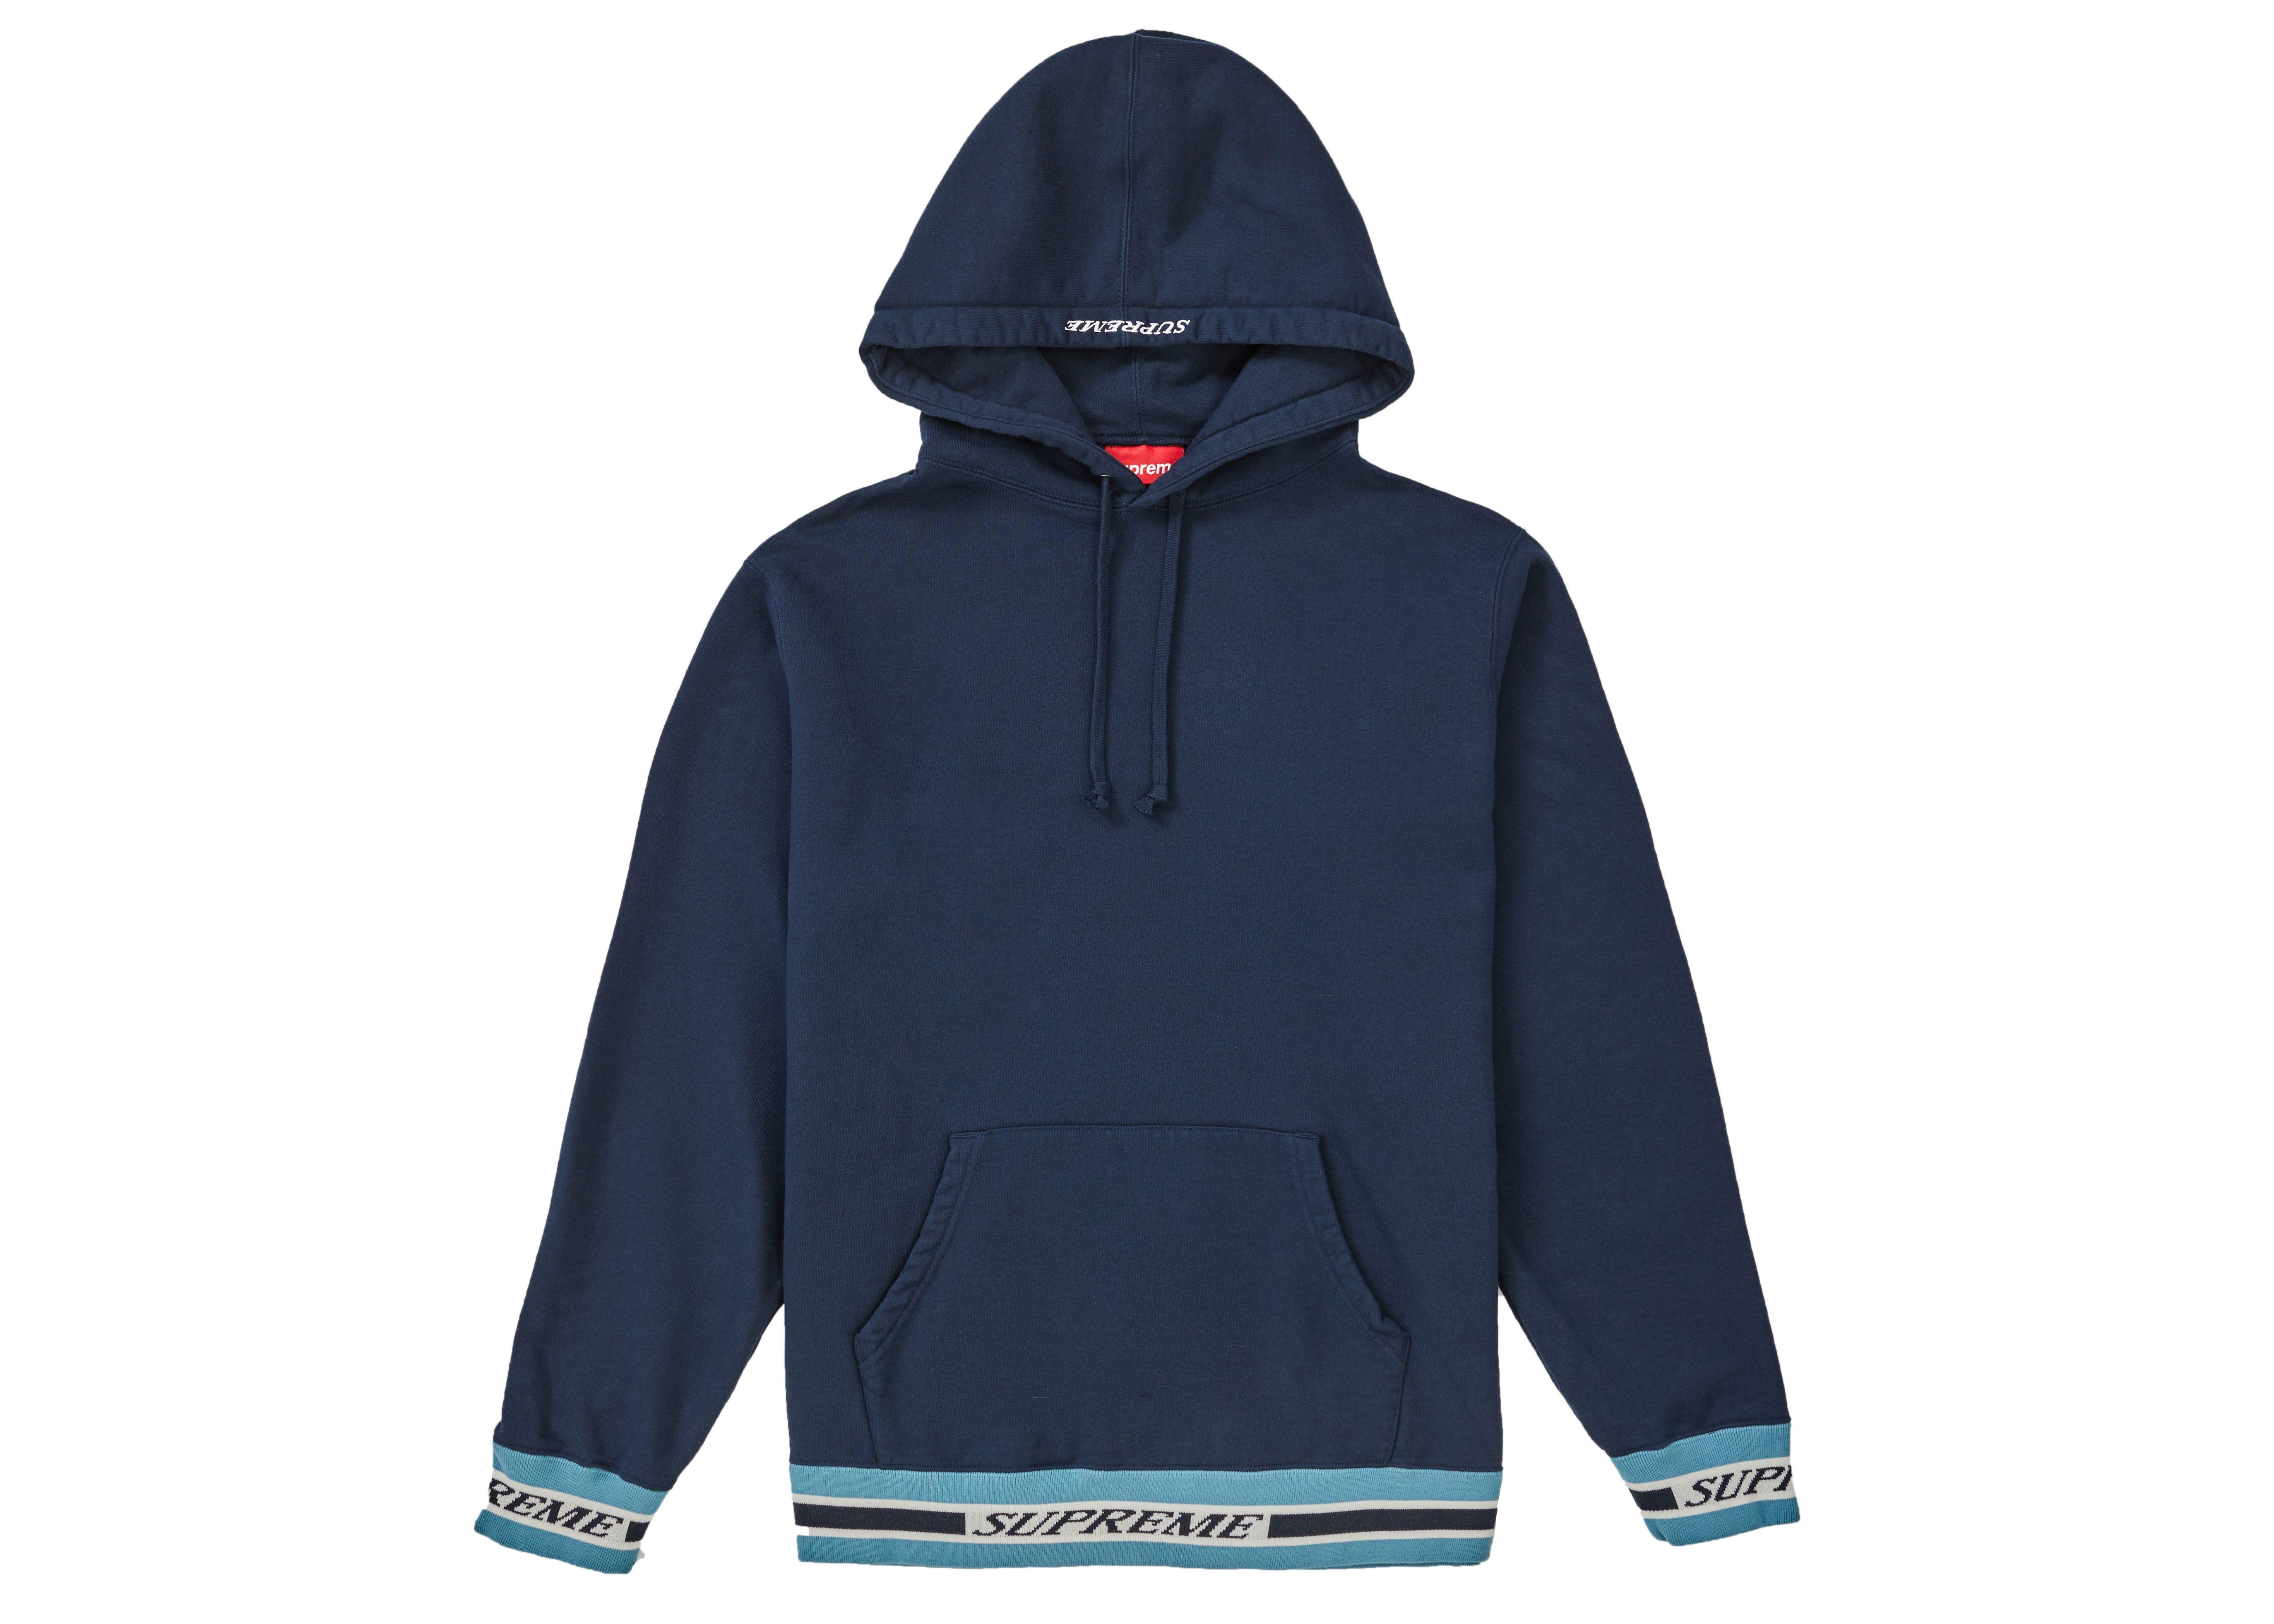 Supreme Striped Rib Hooded Sweatshirt Navy Supreme Cloth Hooded Sweatshirts Sweatshirts Striped [ 3924 x 5494 Pixel ]